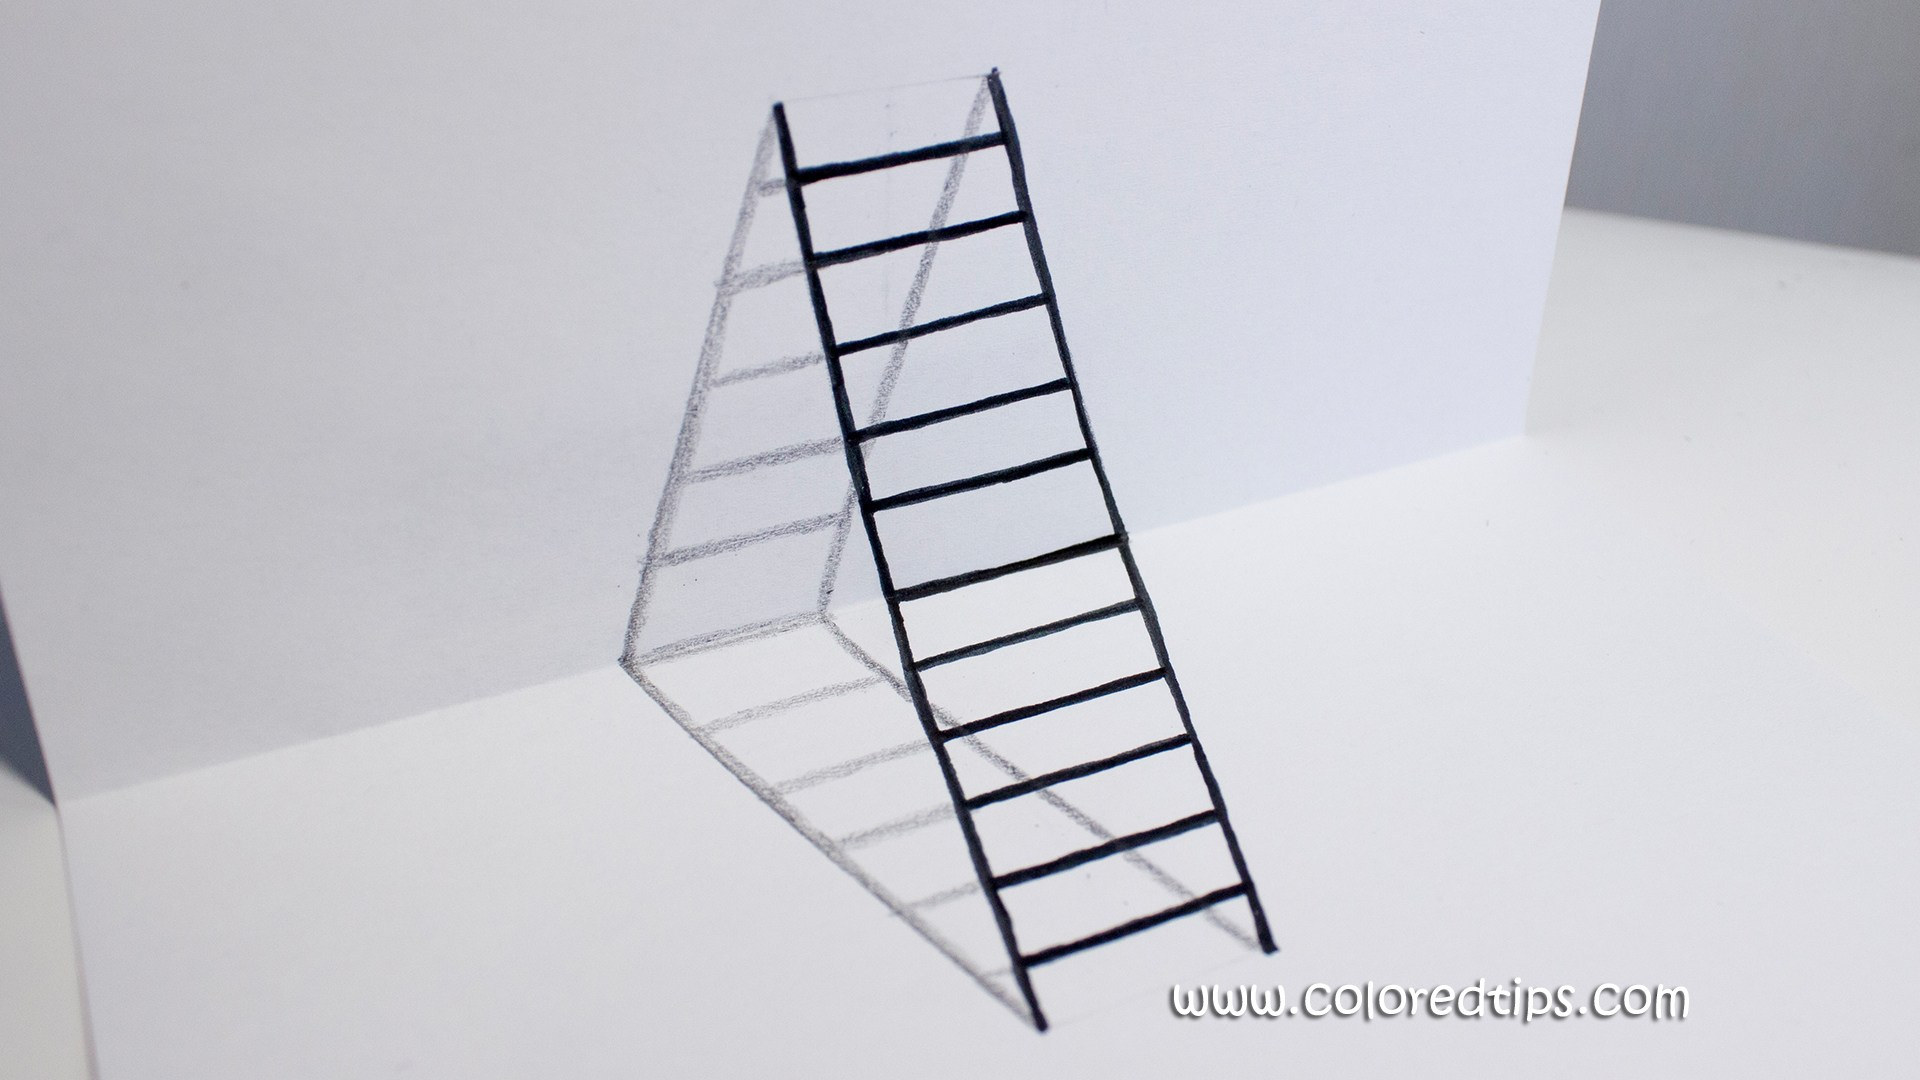 Drawn optical illusion DIY Goddess Ladder Illusion To